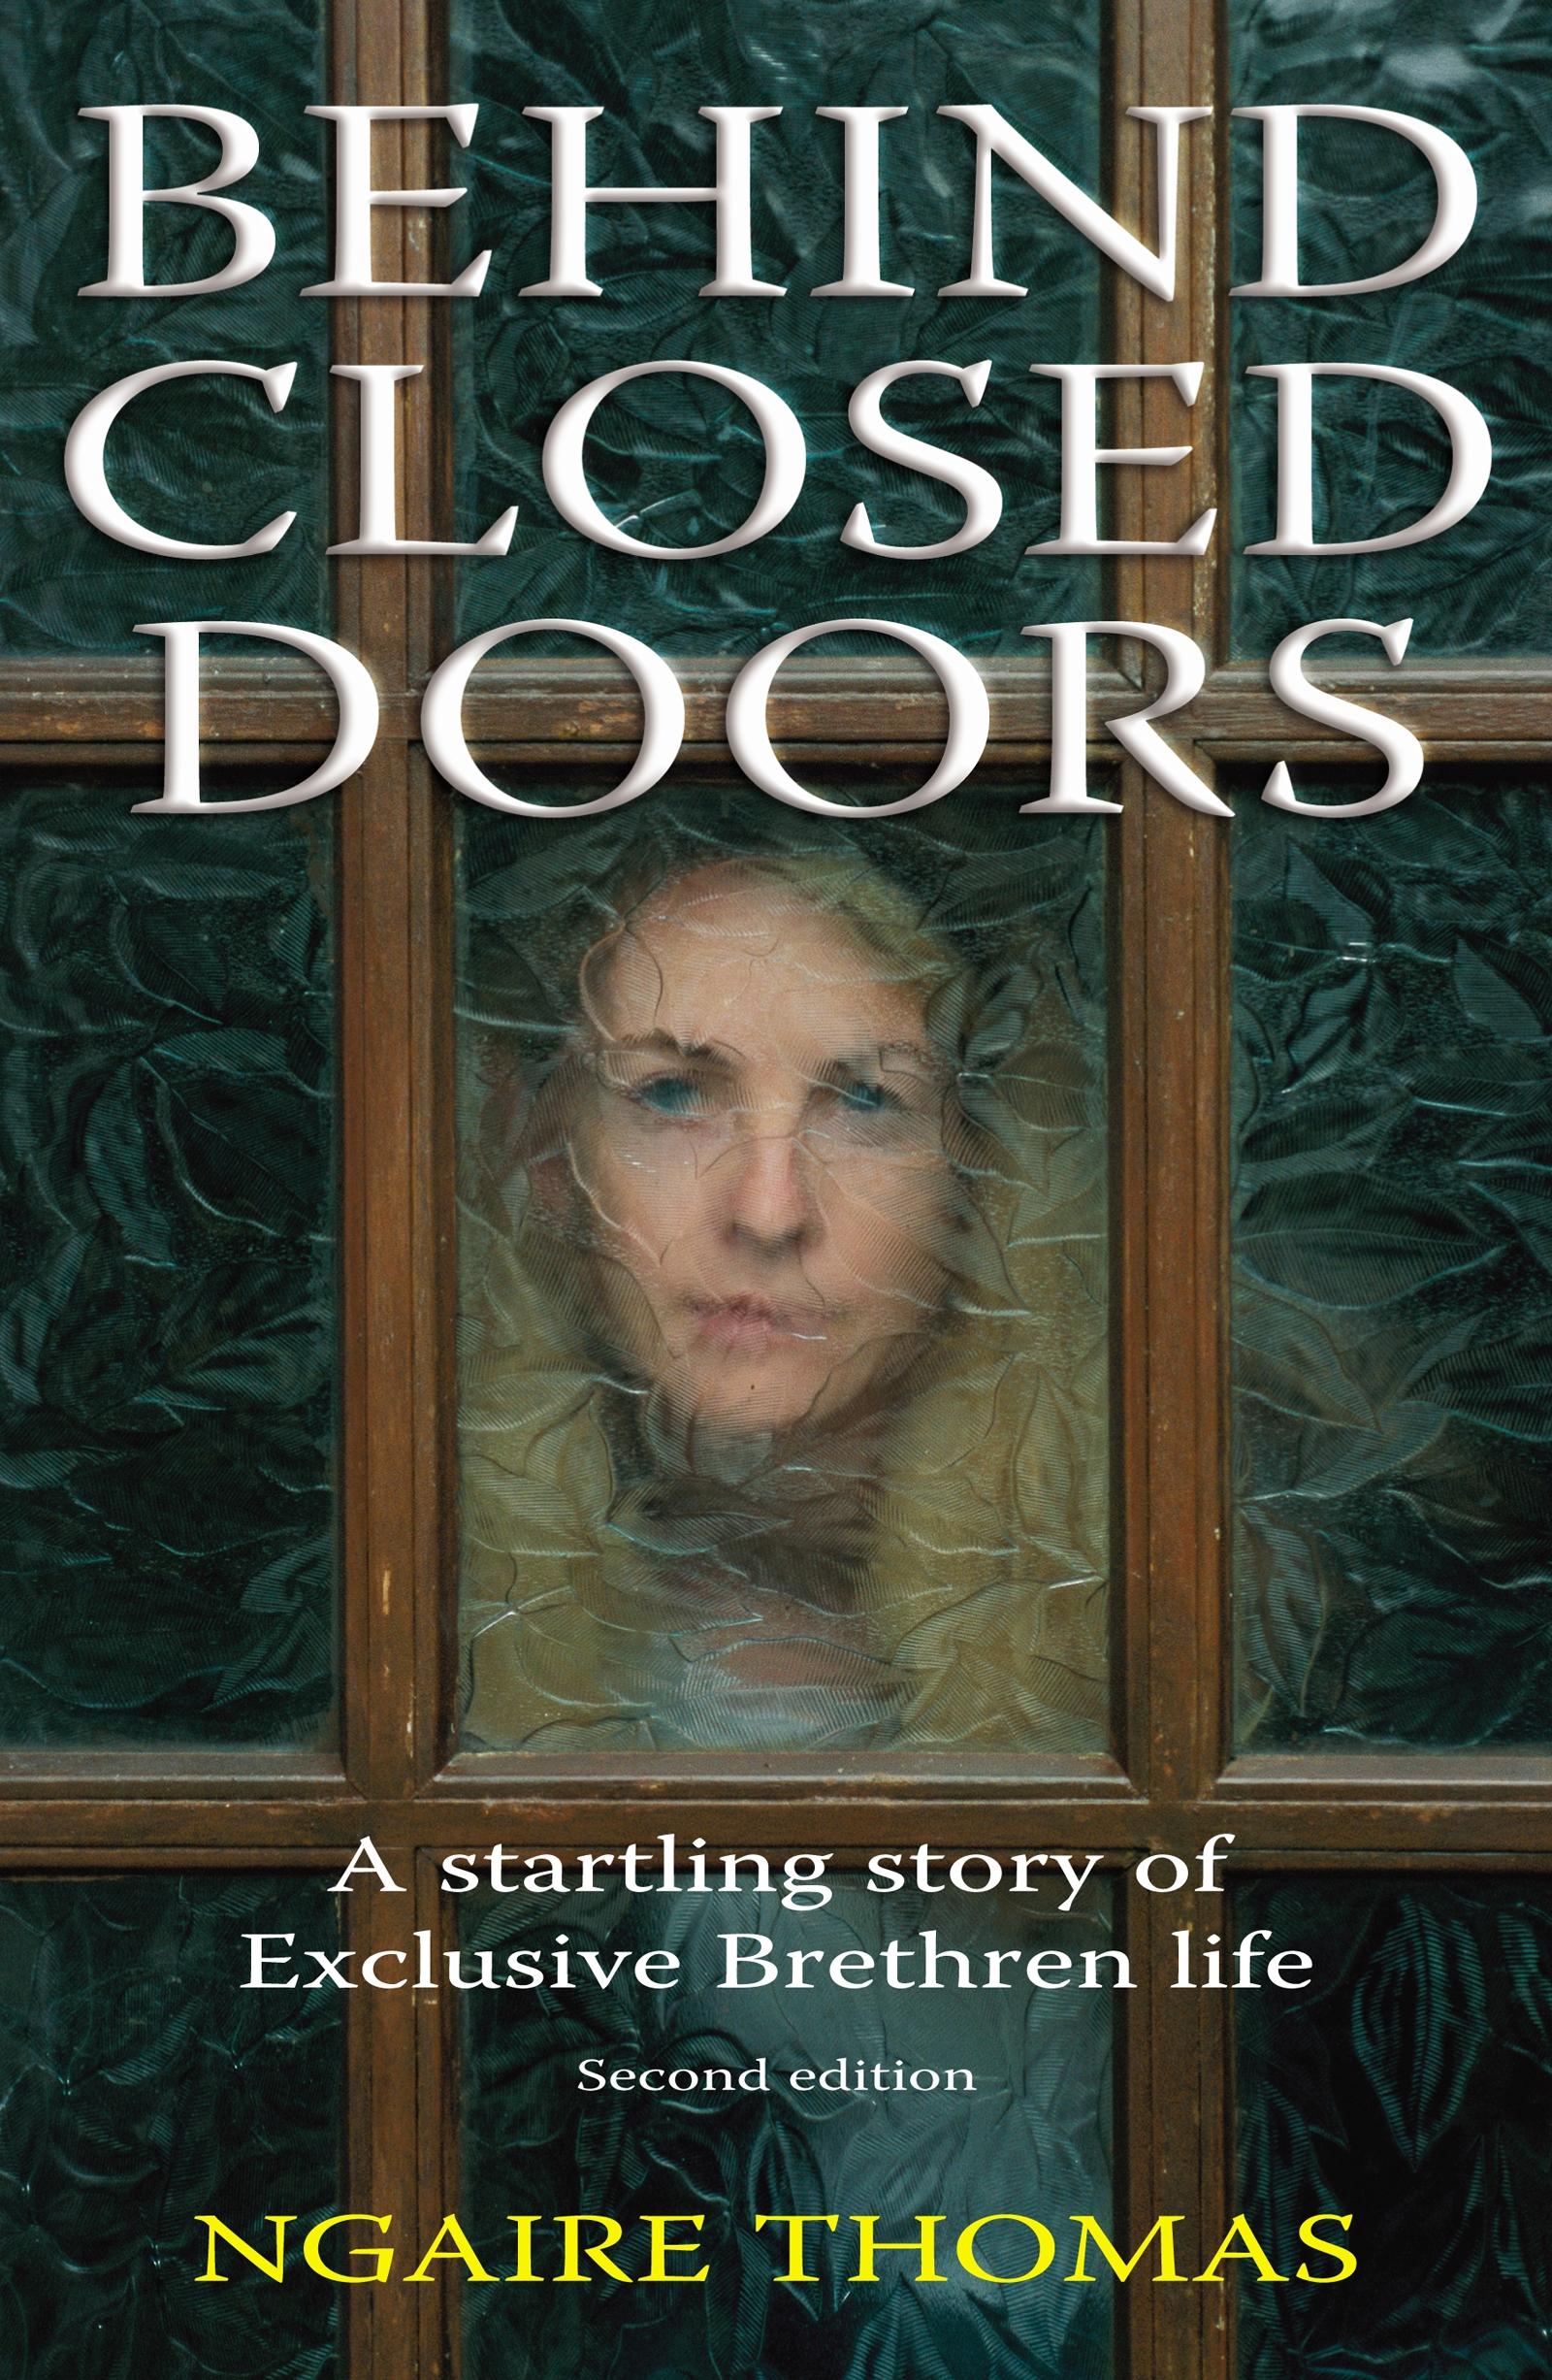 Behind Closed Doors : Behind closed doors penguin books new zealand